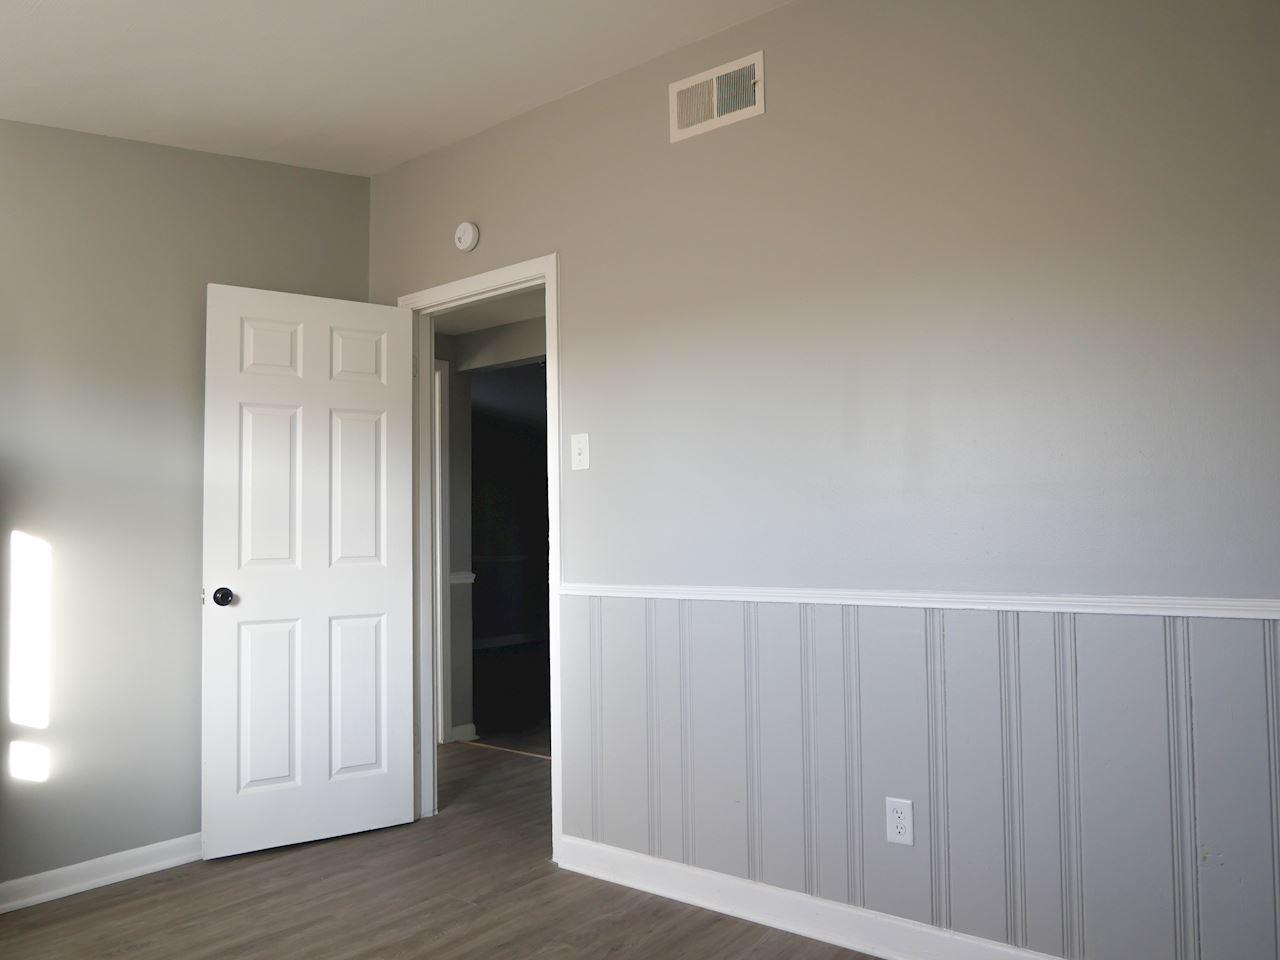 investment property - 2714 Nix Cv, Memphis, TN 38127, Shelby - image 9